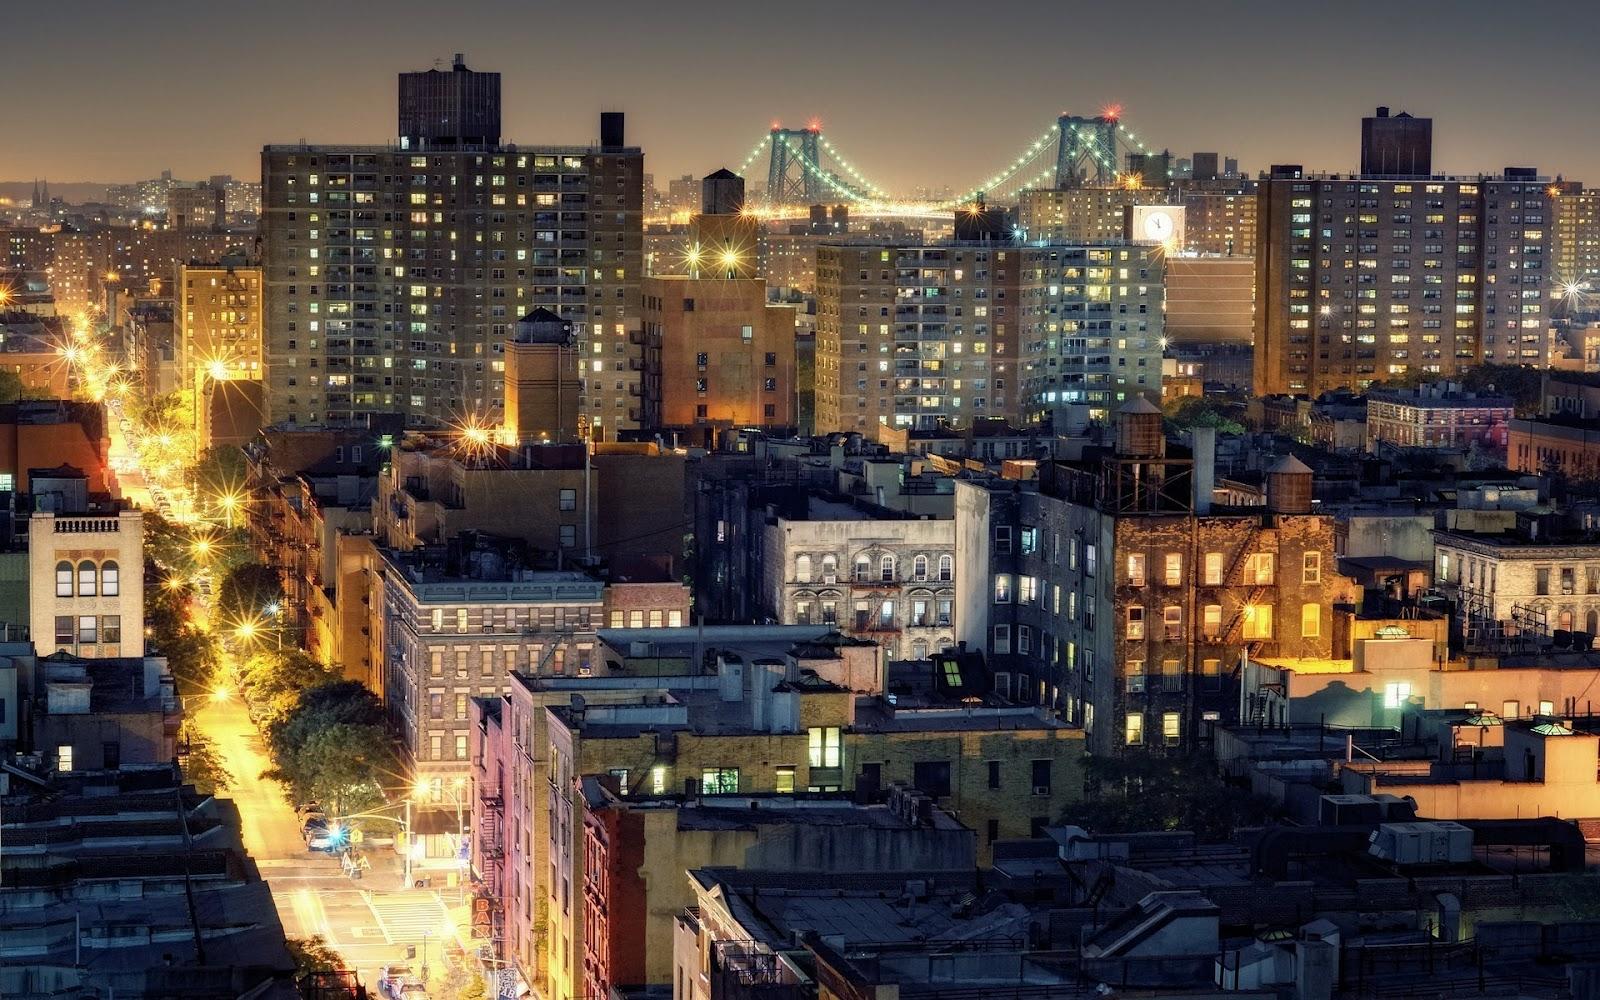 http://2.bp.blogspot.com/-JgnP5s4lnzQ/T2DAdVMUd5I/AAAAAAAAWgA/PyzCmJ16Syw/s1600/Puente-de-Brooklyn-NYC_Brooklyn-Bridge_11.jpg